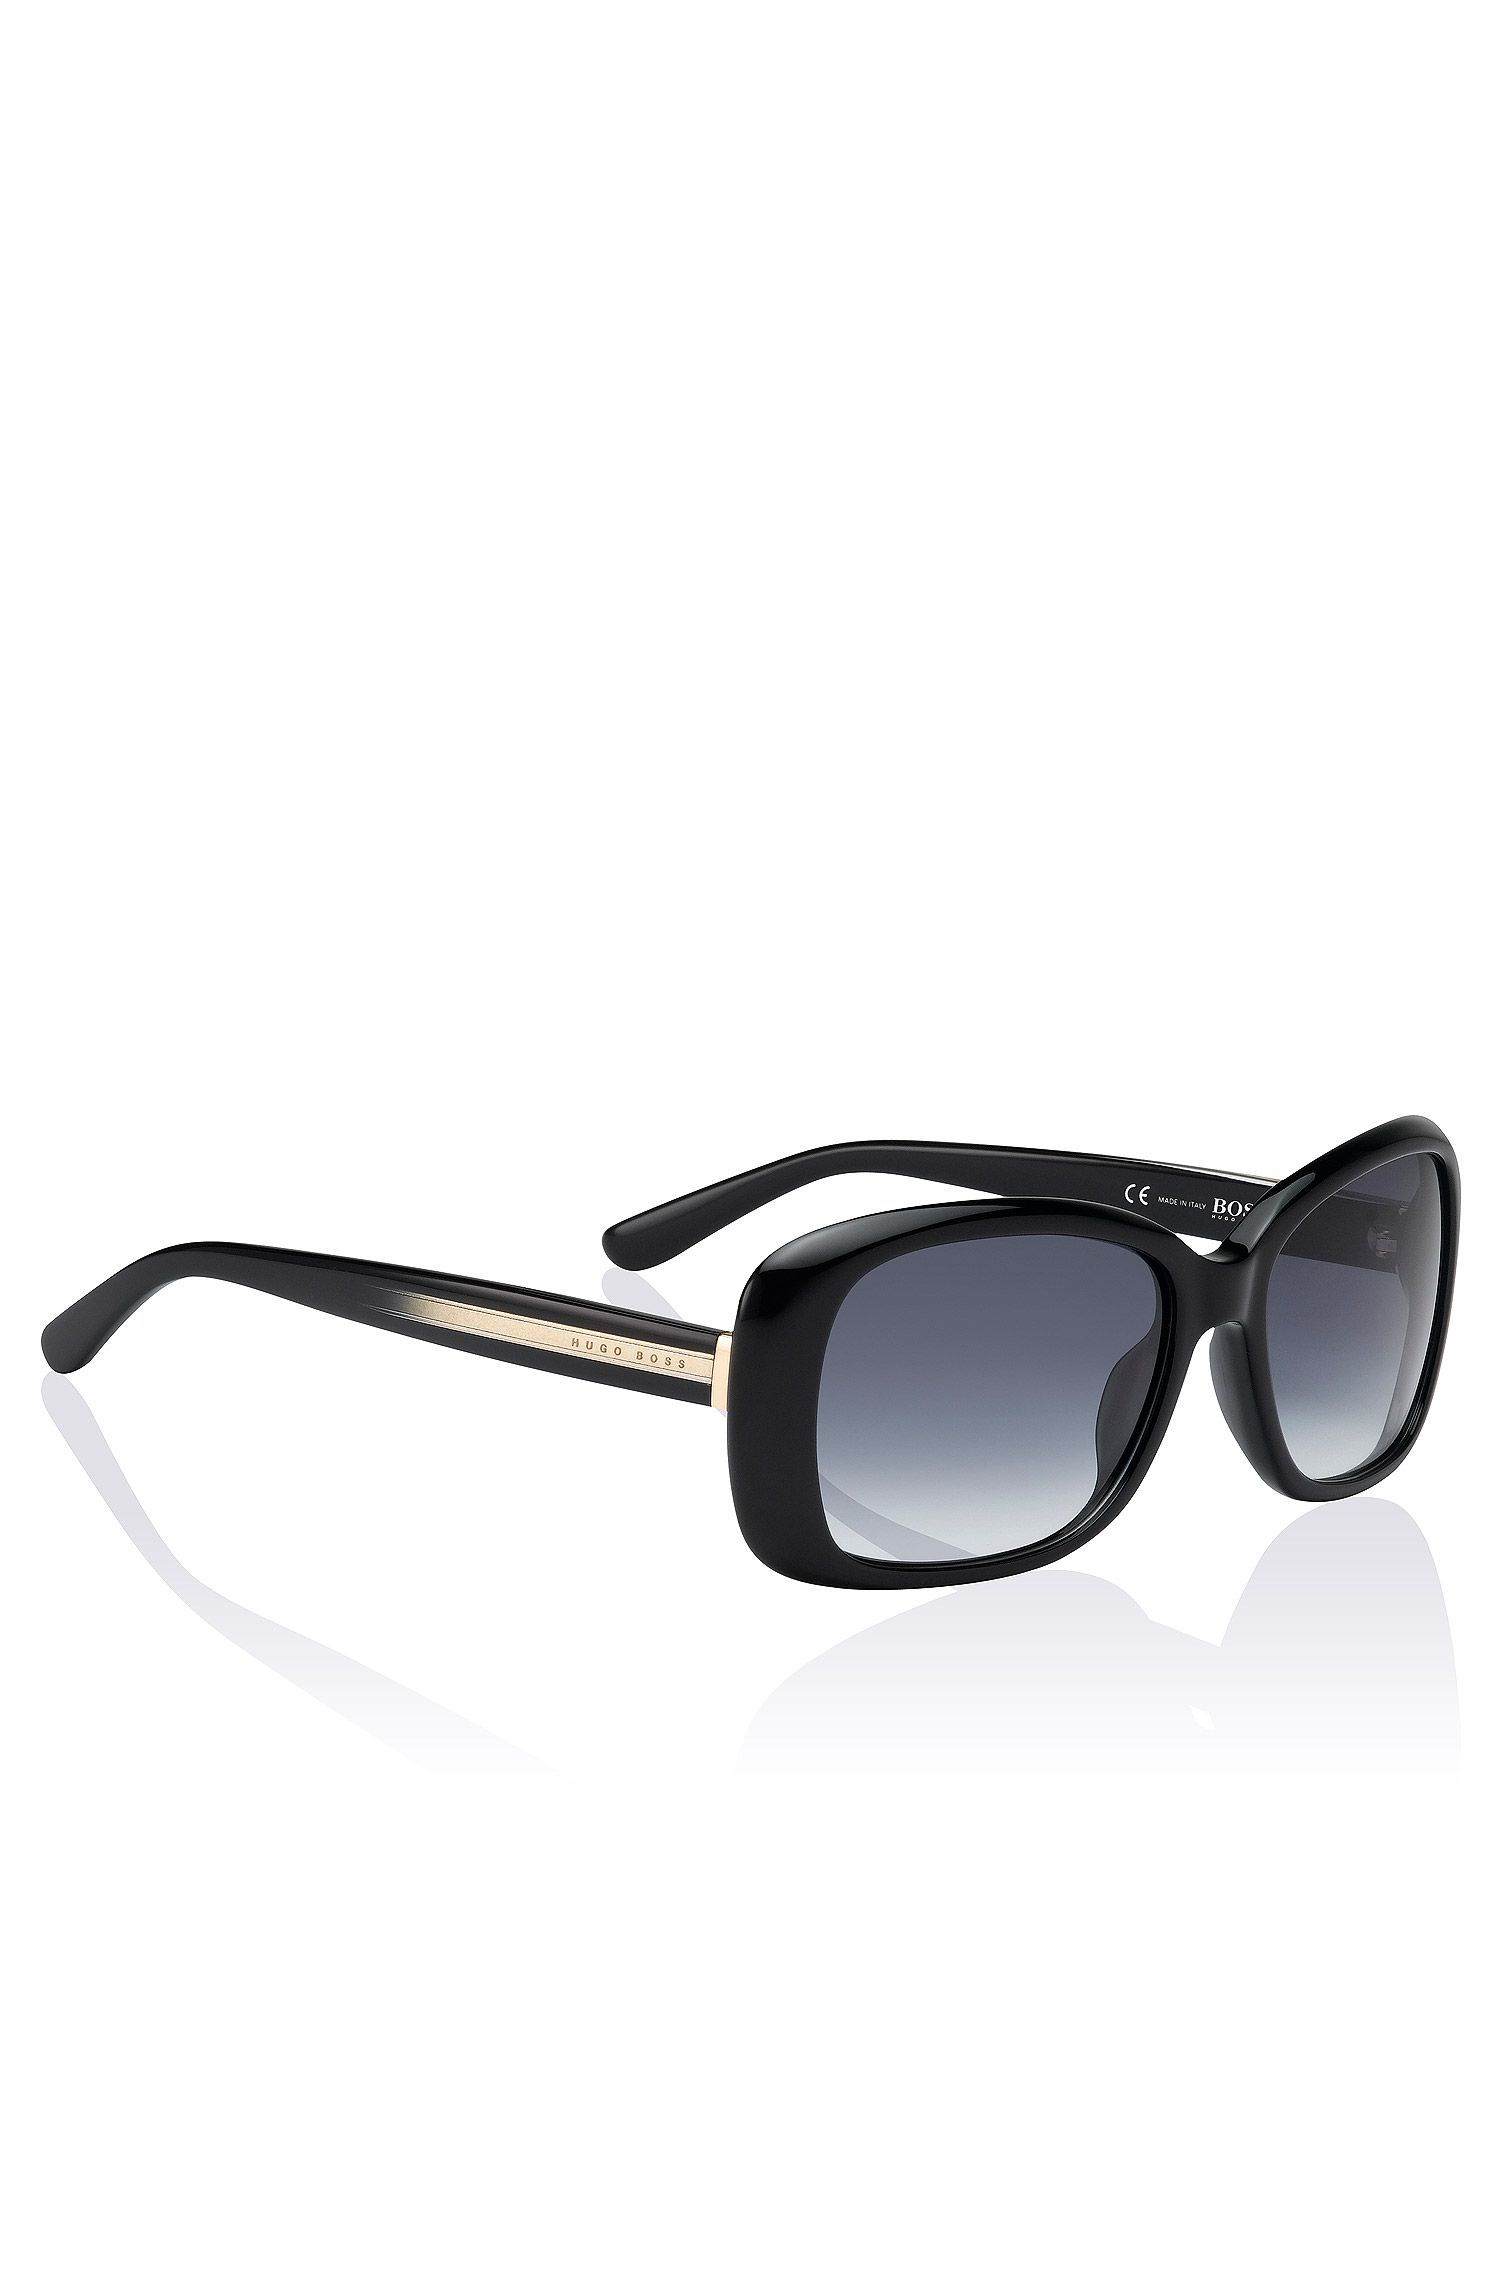 Sonnenbrille ´BOSS 0613/S`